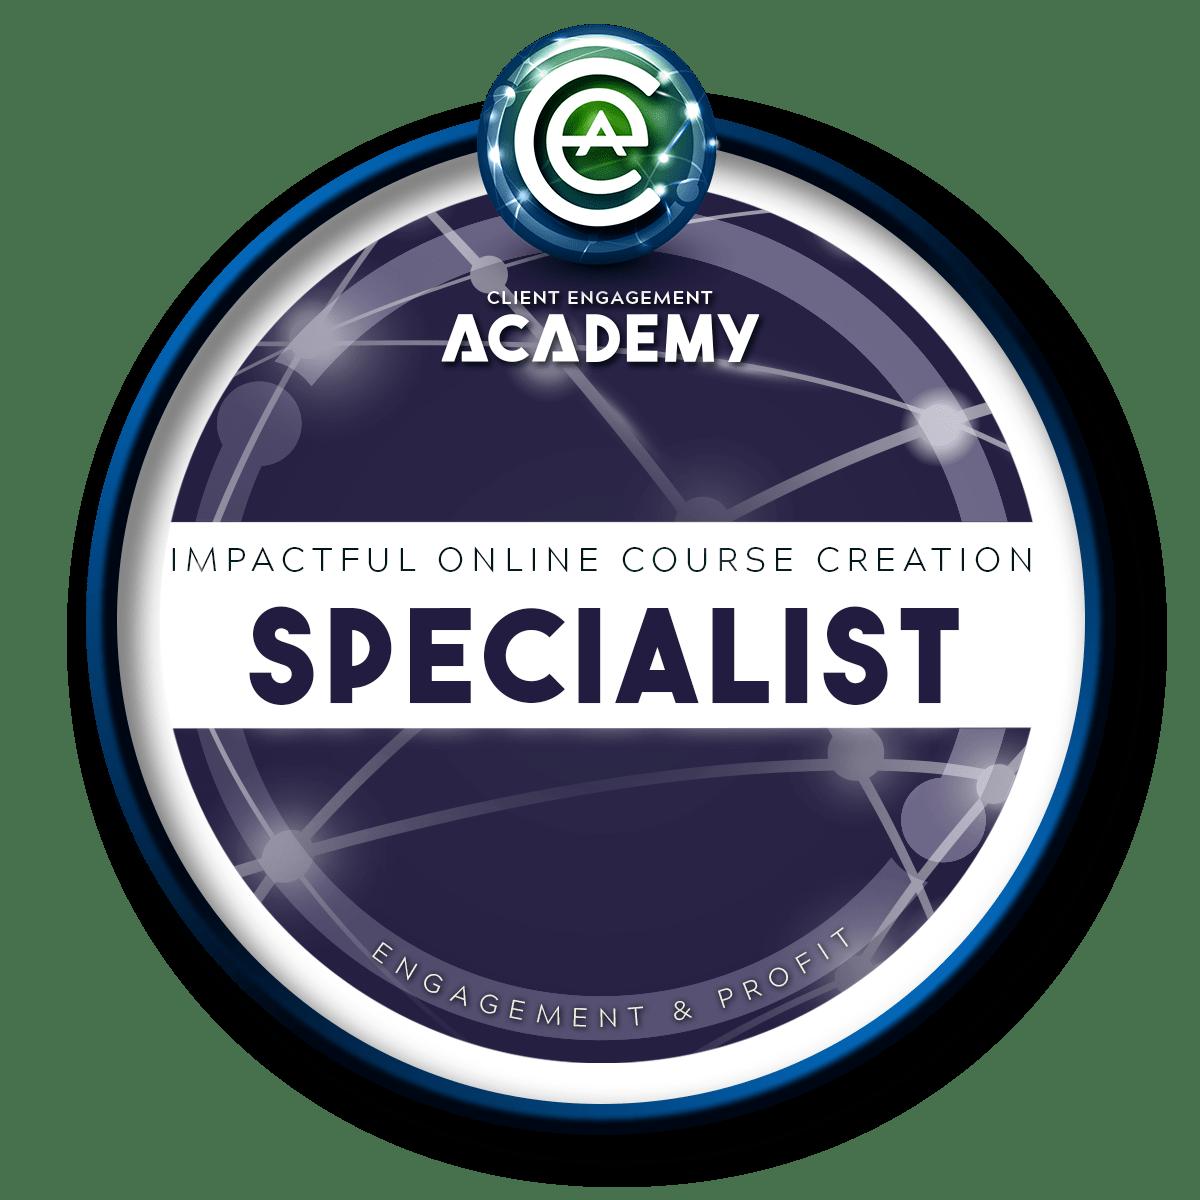 Impactful Online Course Creation Course